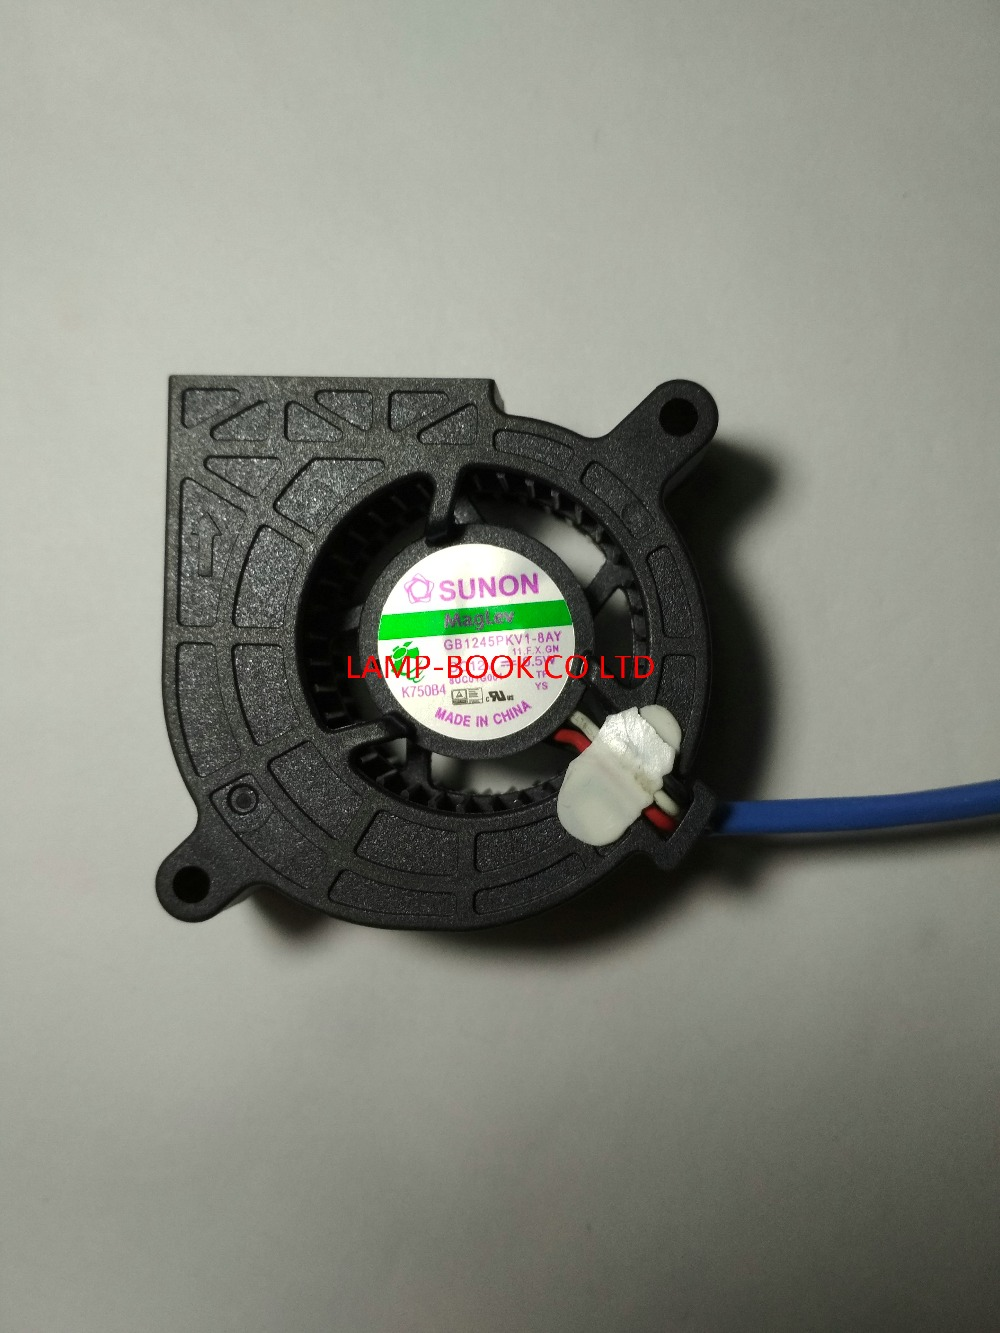 1PC Neu SUNON GB1245PKV1-8AY 12V 0.5W